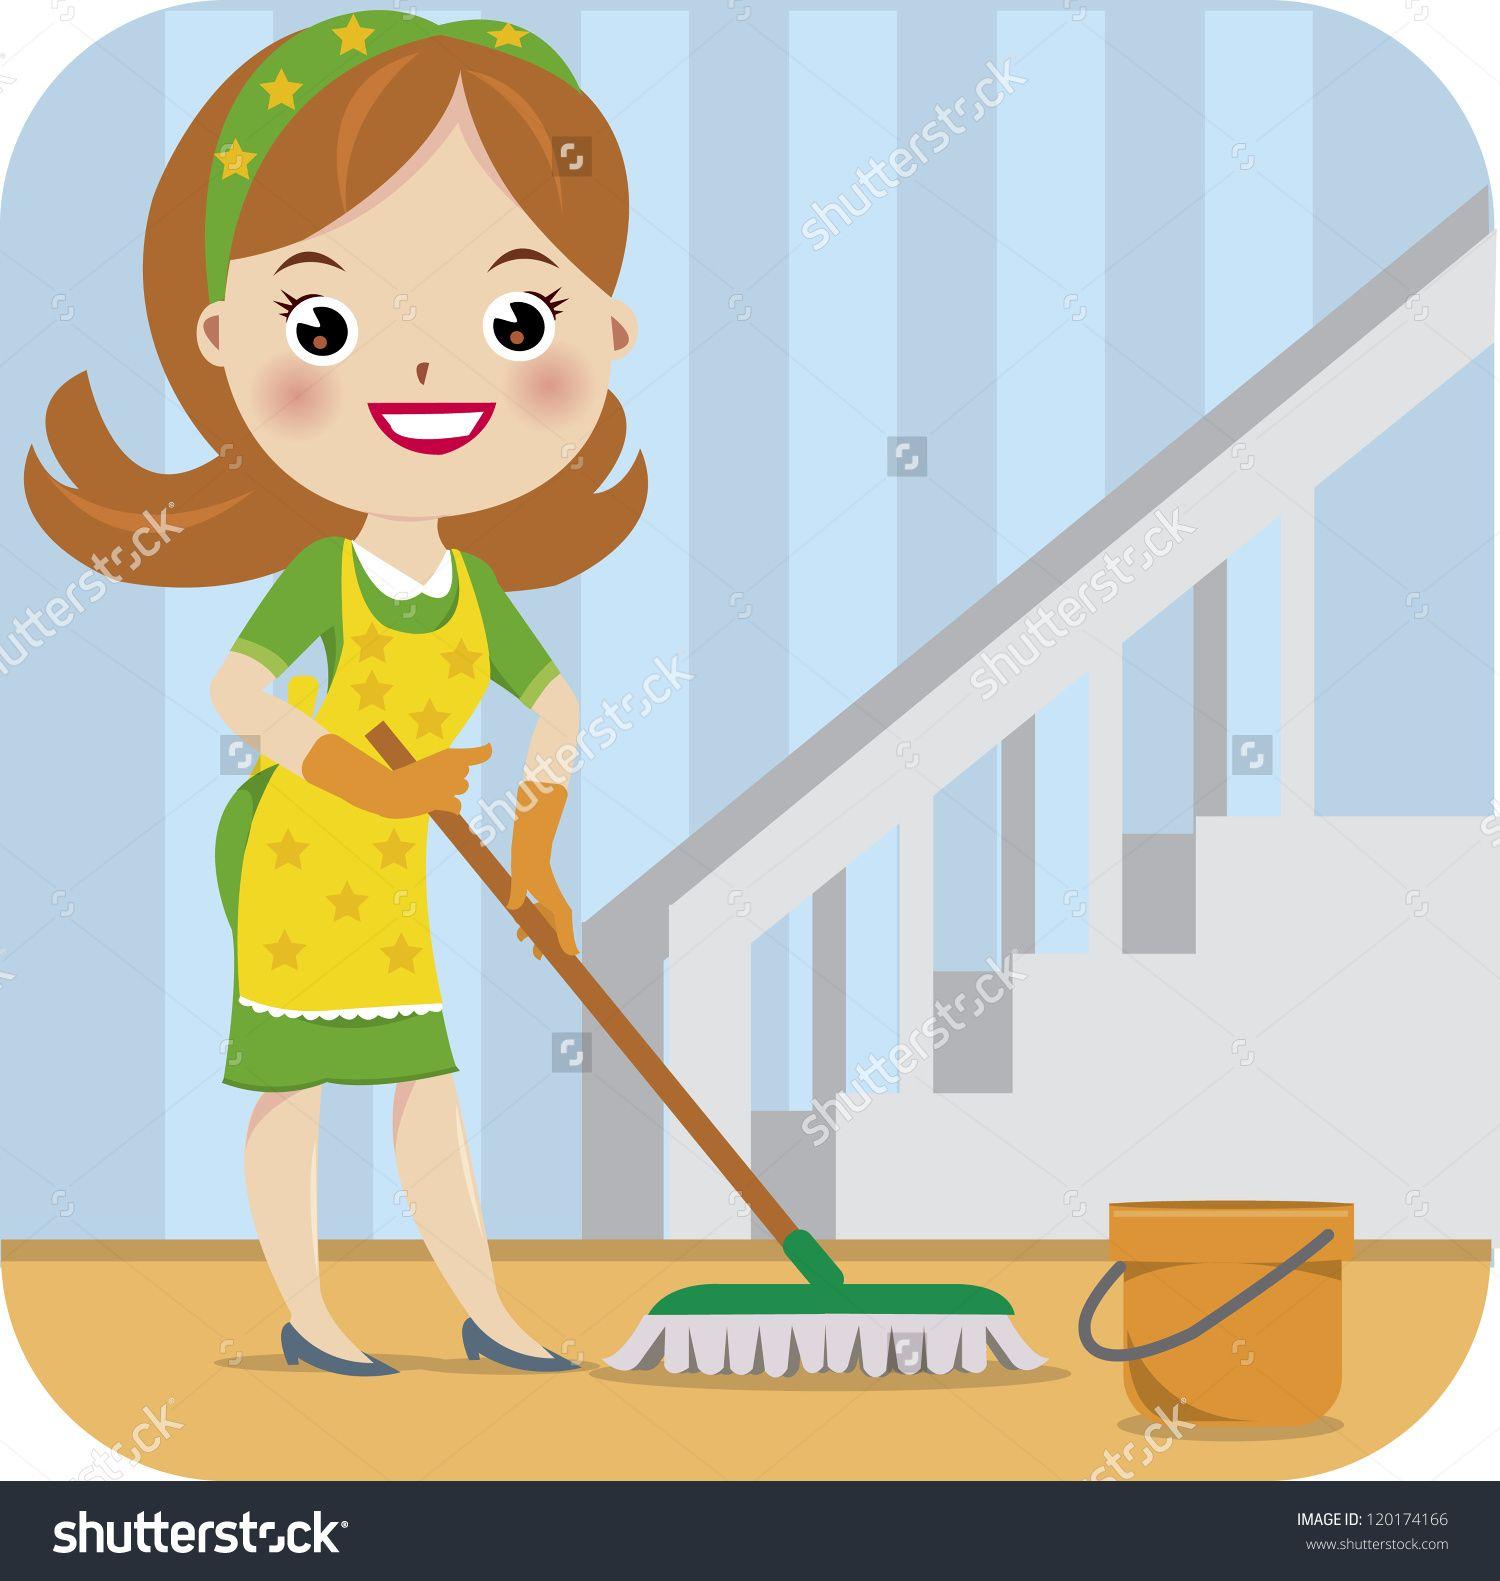 Me madre limpia la casa..